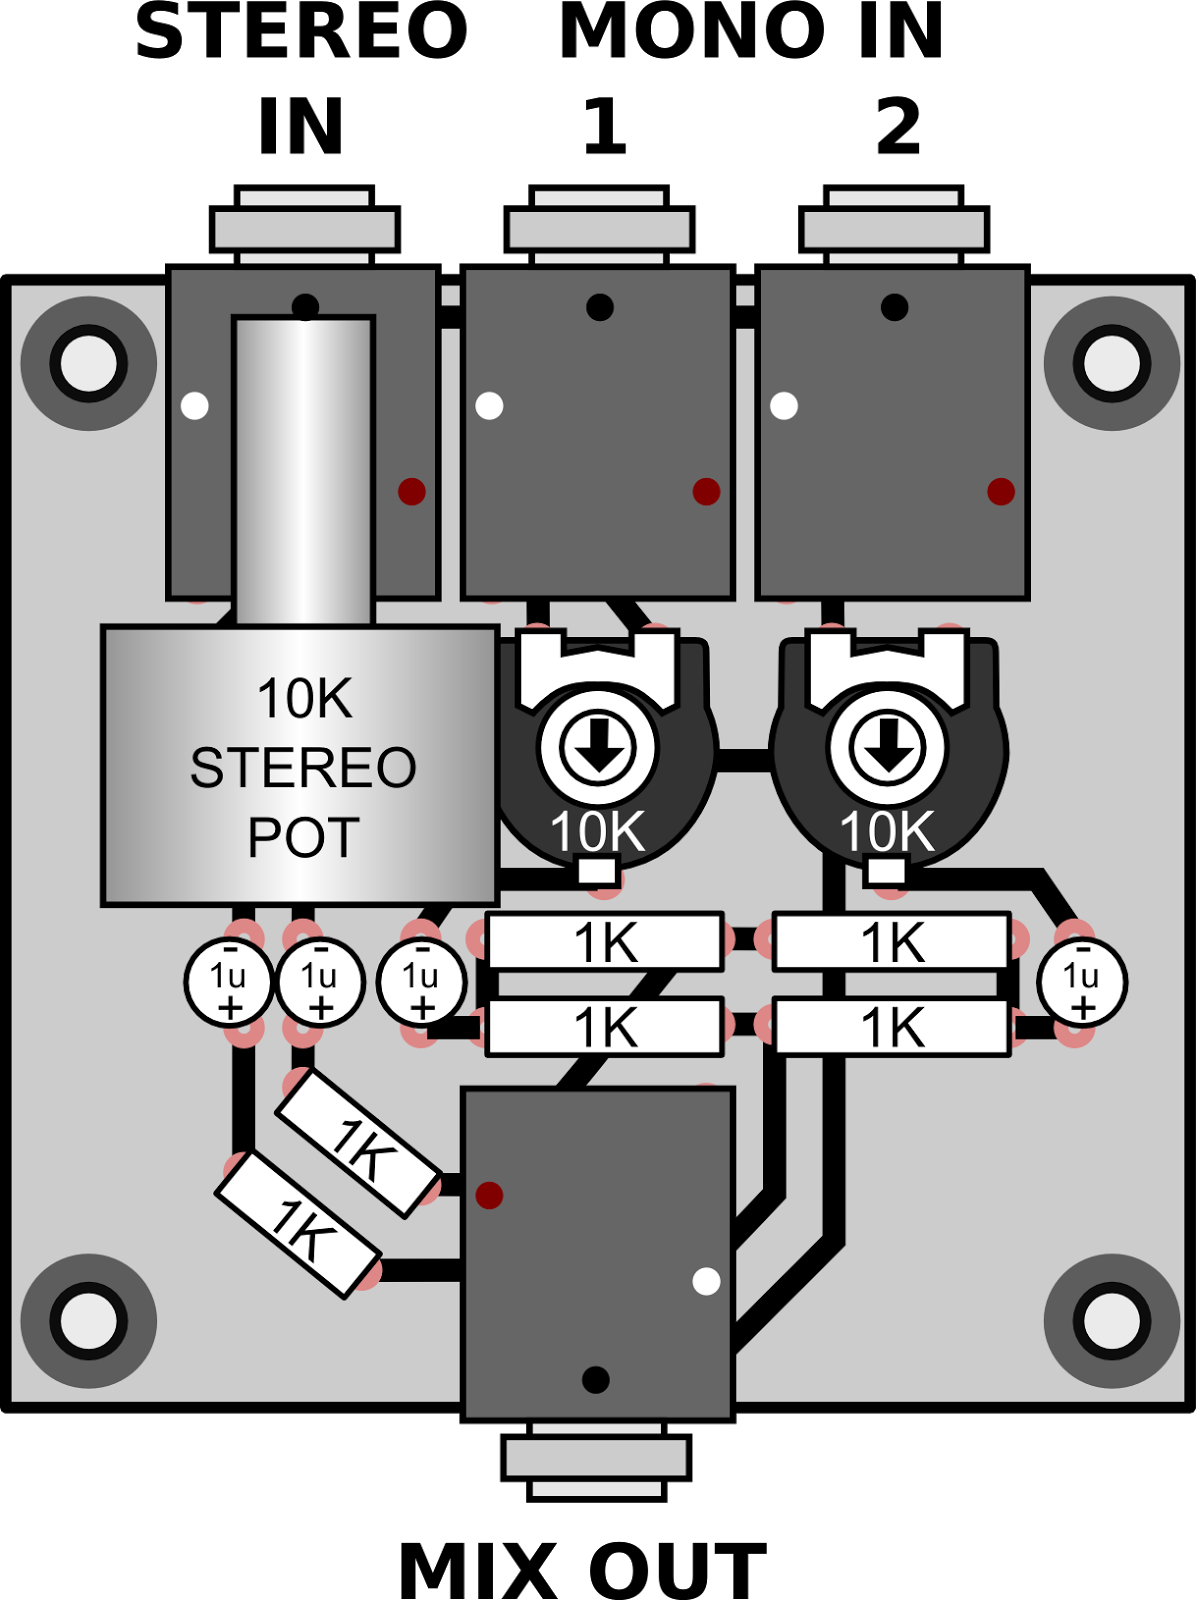 4 Channel Audio Mixer Schematic Manual Guide Wiring Diagram Circuit Therandomlab Simple Passive Mono Stereo To